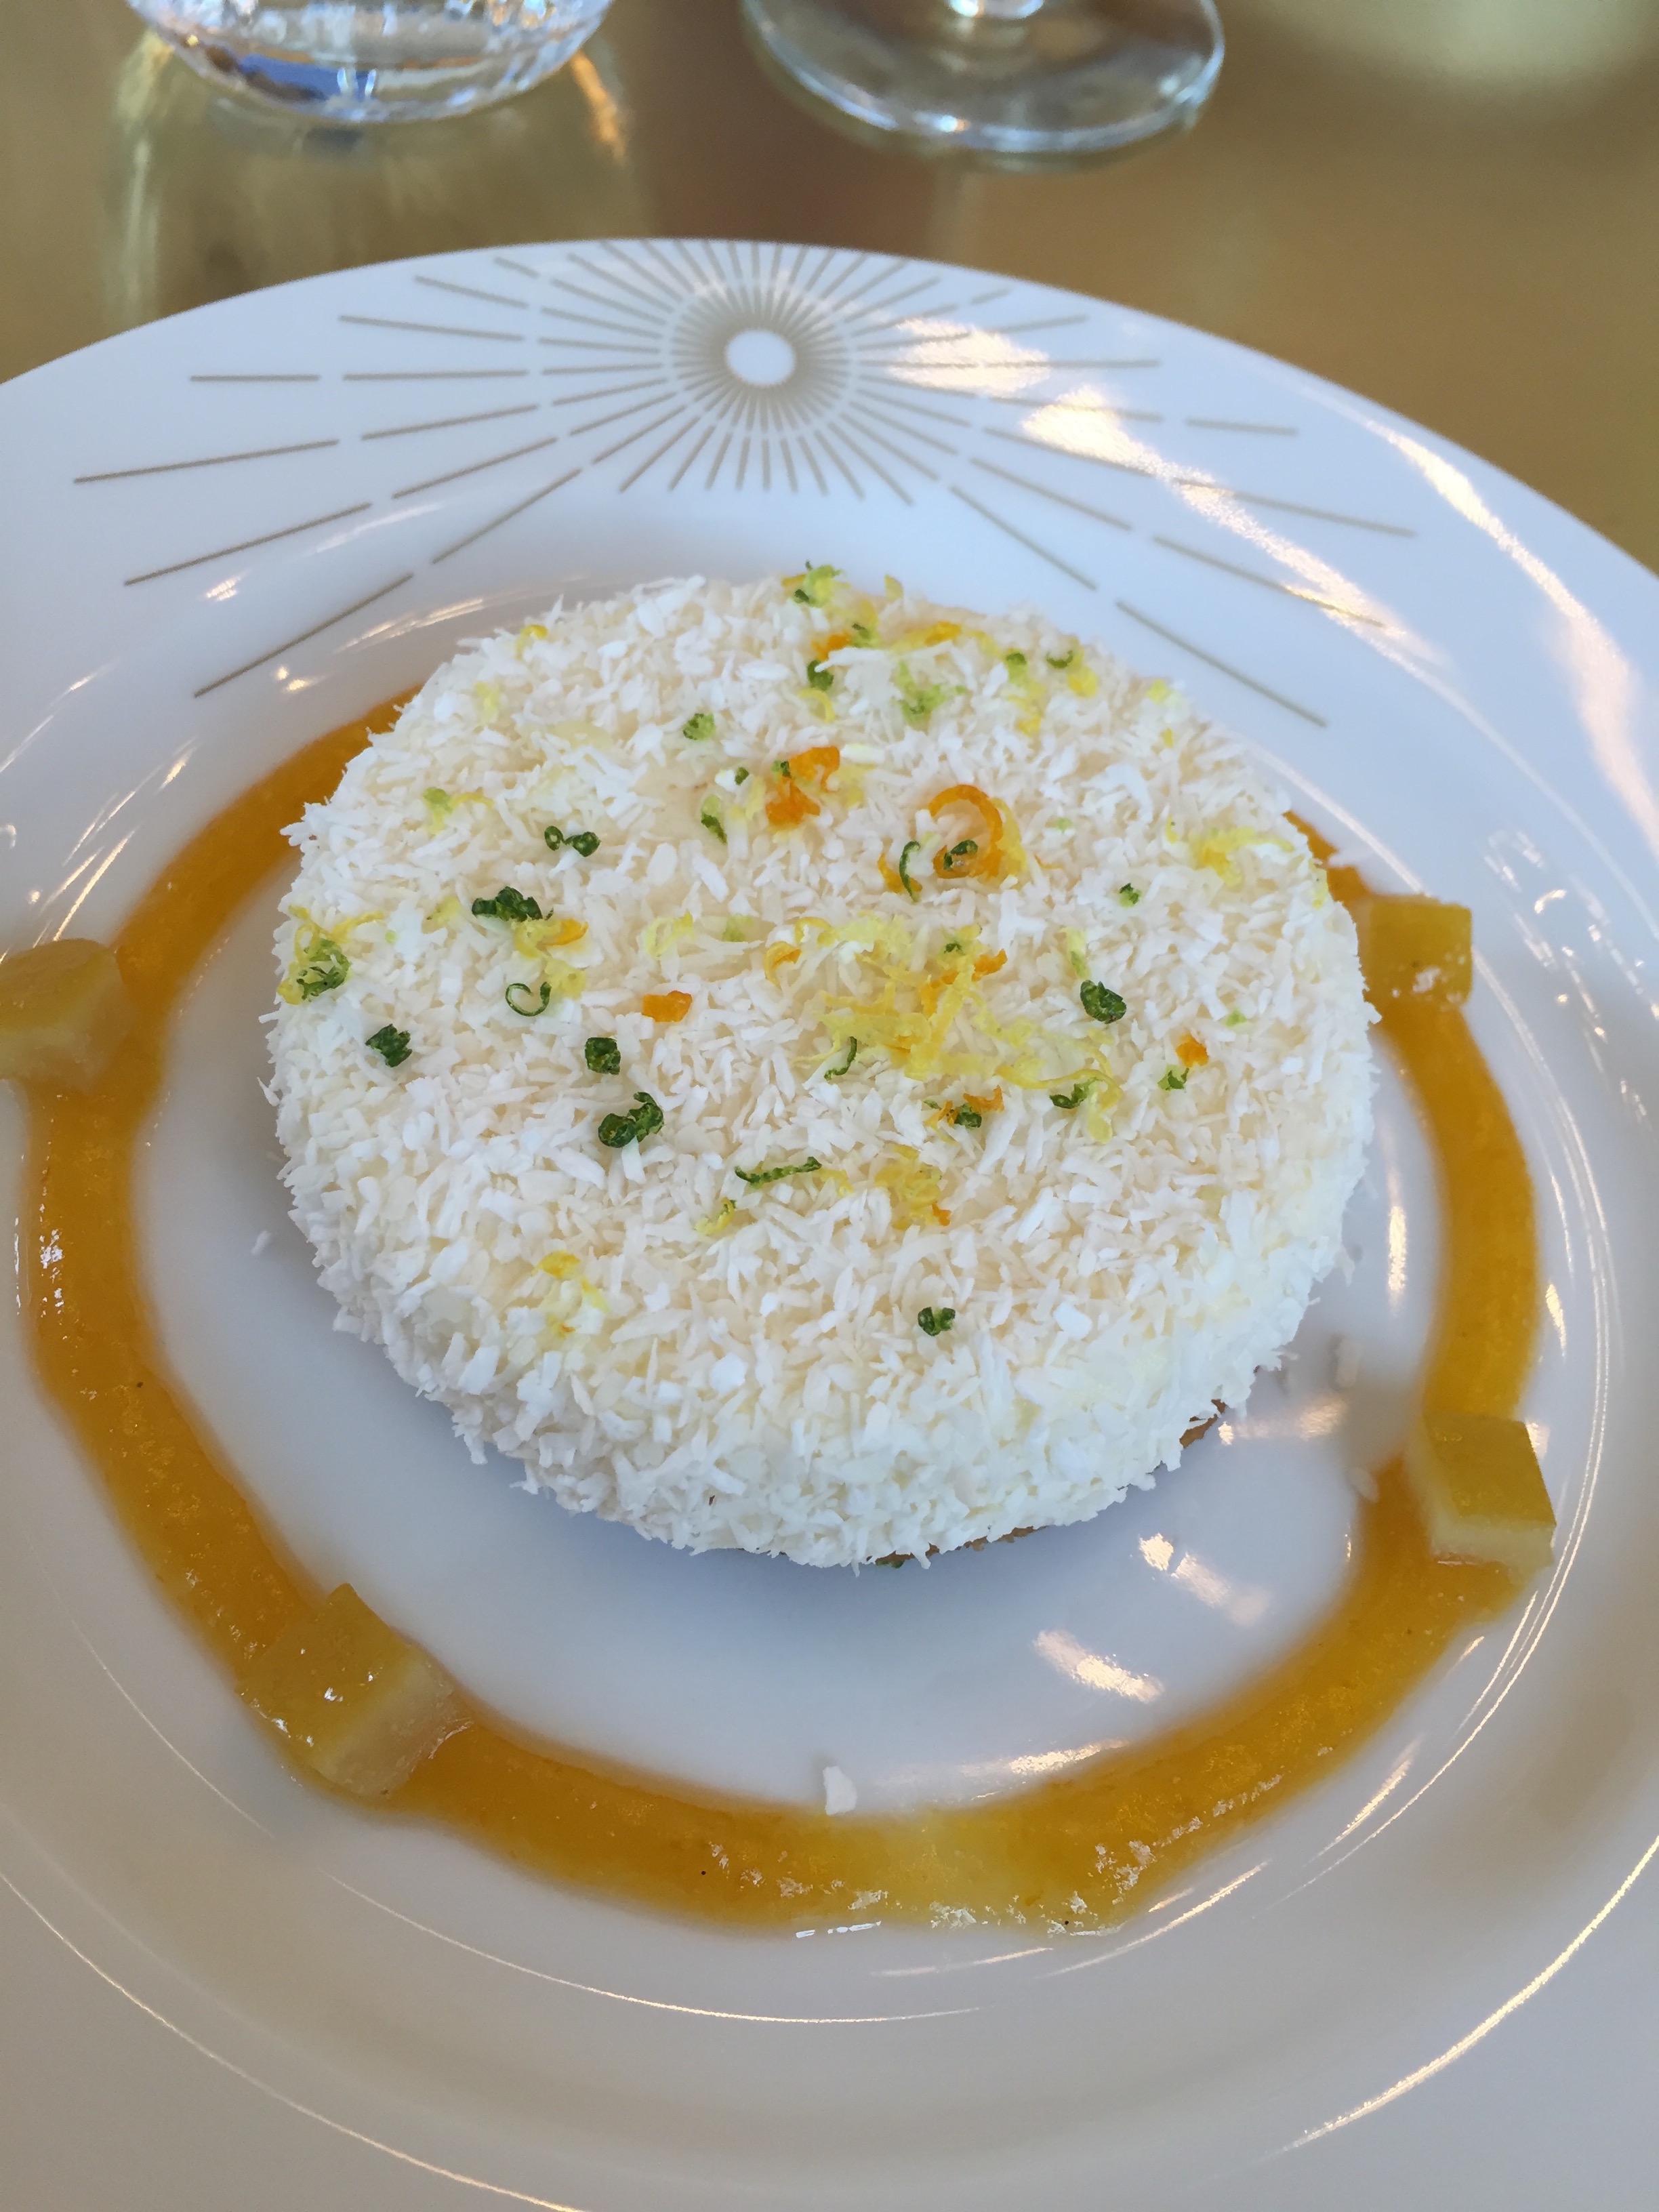 Ore restaurant, Versailles - Modern cheesecake @ Alexander Lobrano